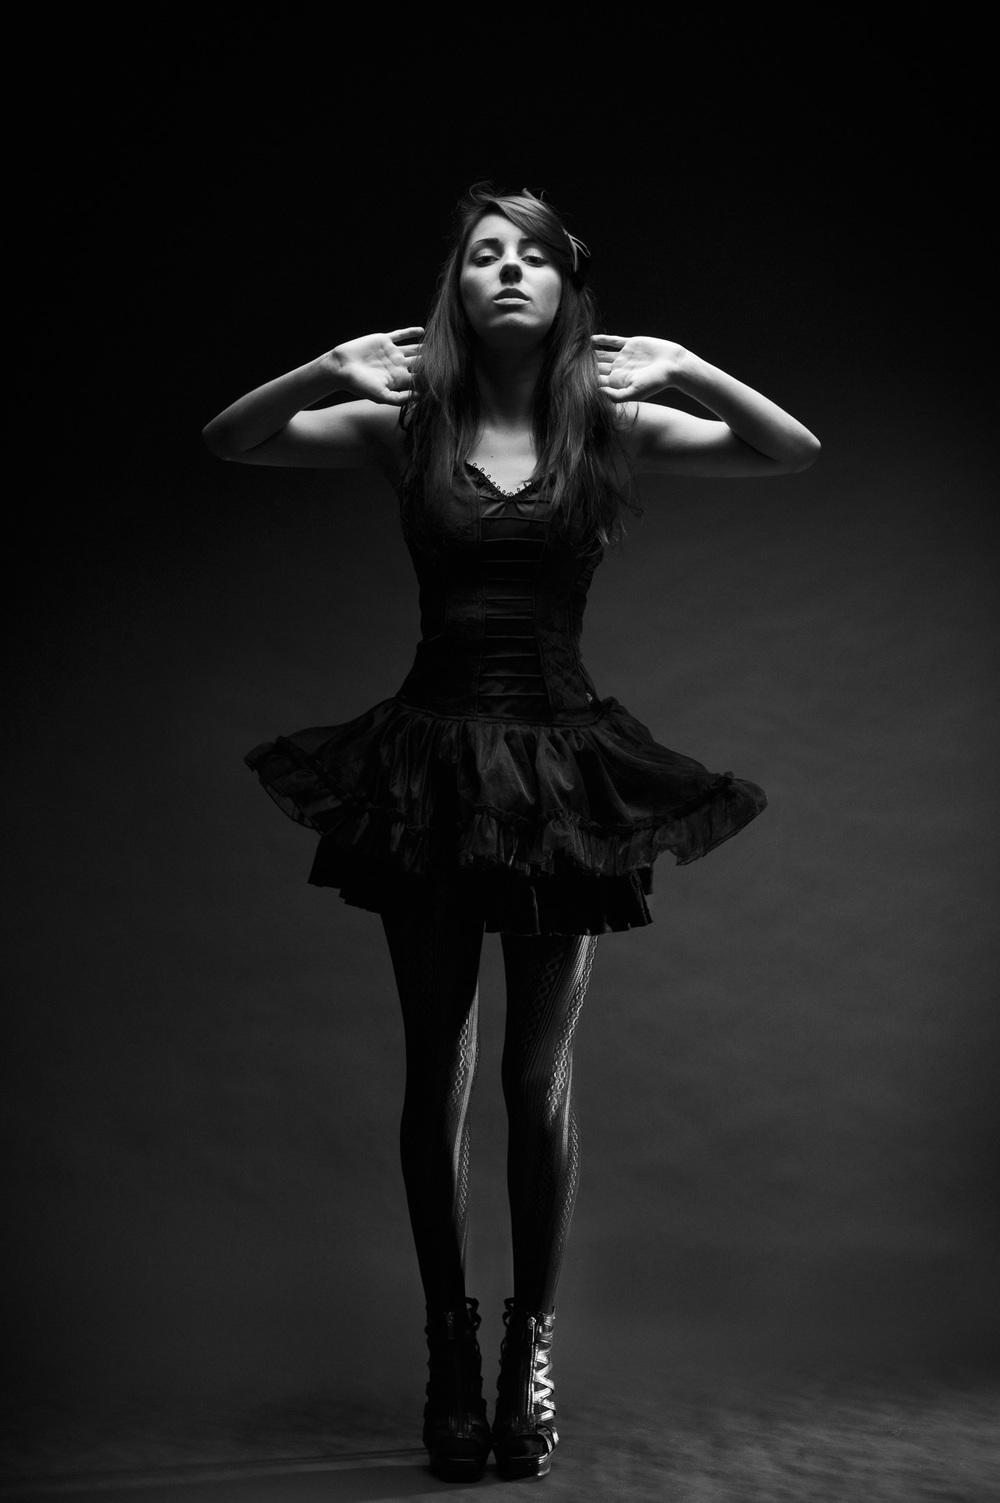 HannahRay_Dress_BW-2v2.jpg